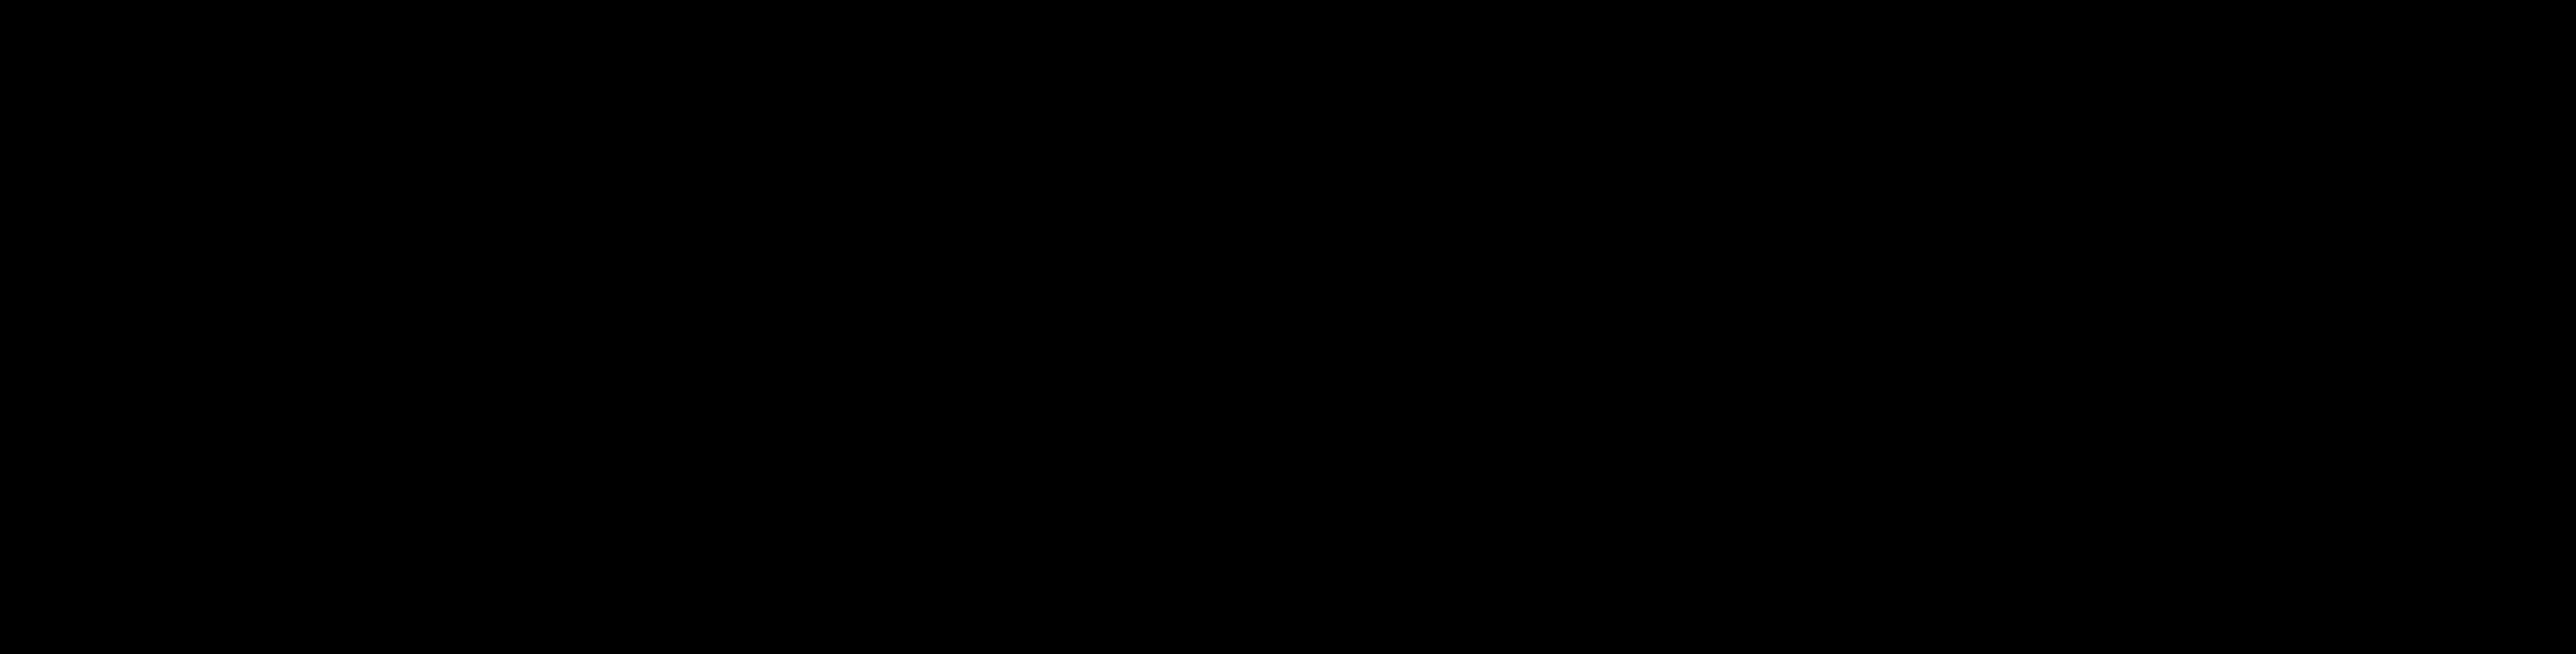 Watercraft,Silhouette,Angle